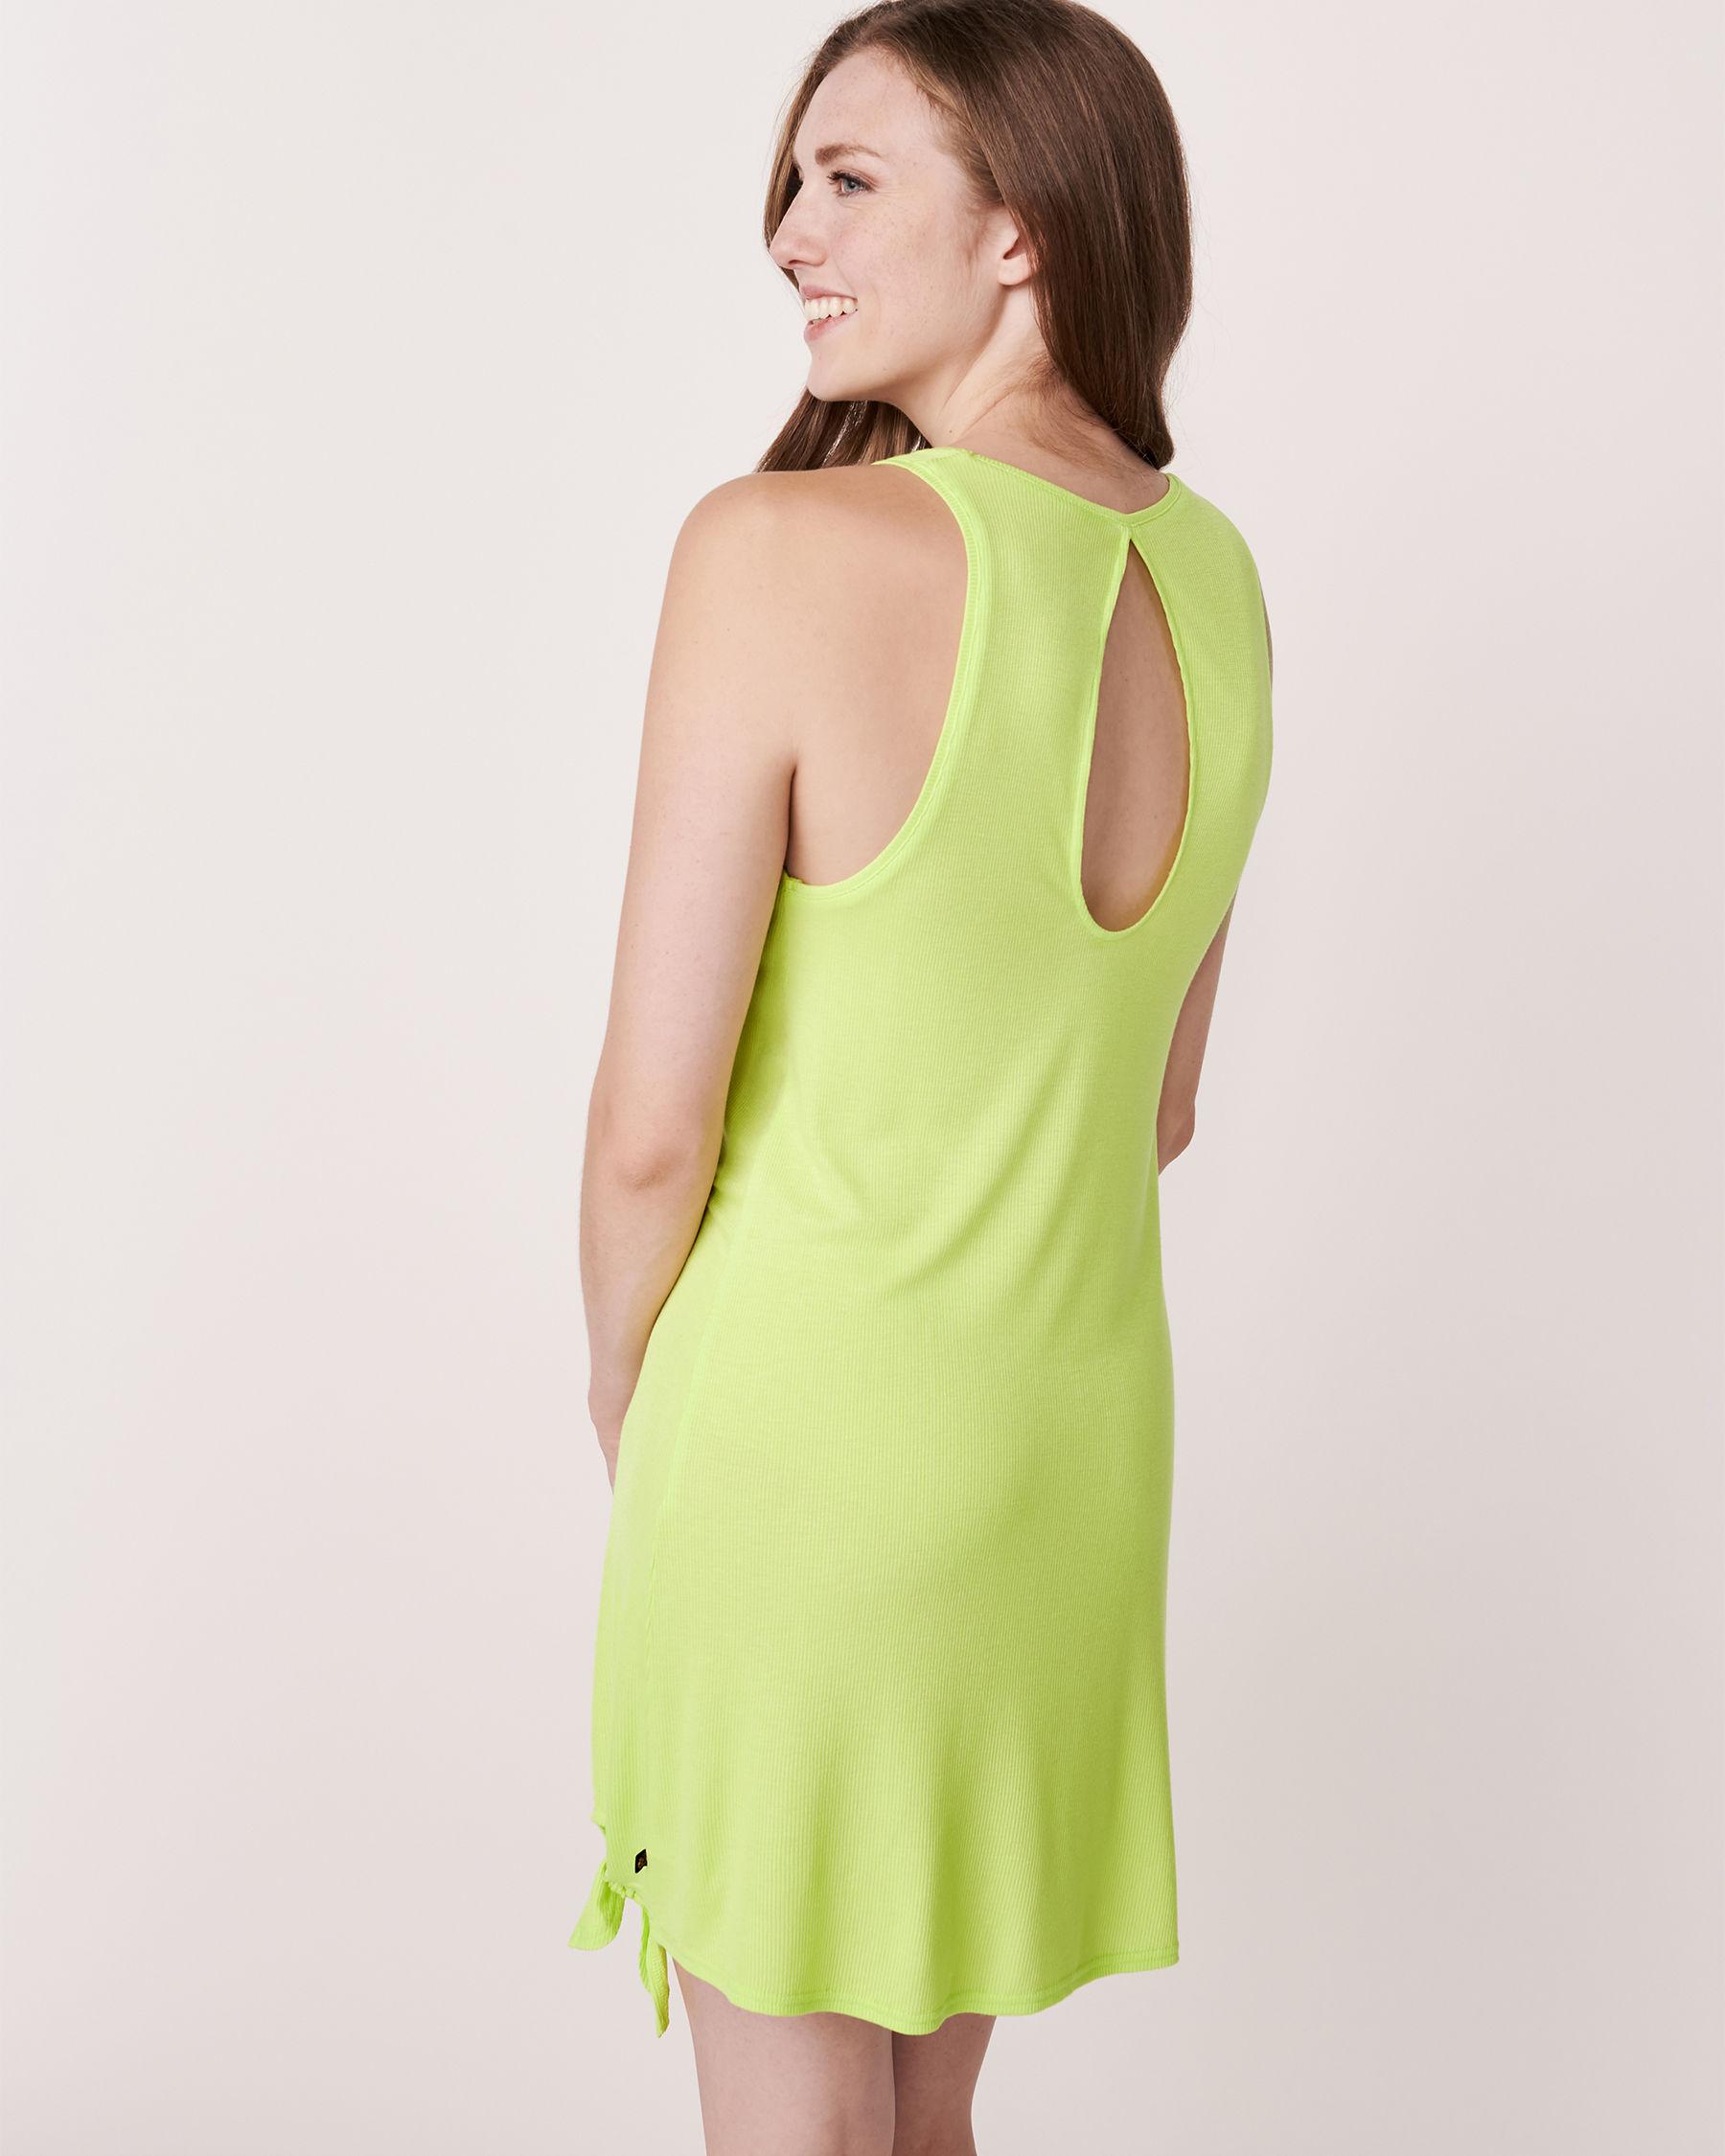 LA VIE EN ROSE AQUA Knotted Sleeveless Dress Lime 80400002 - View4